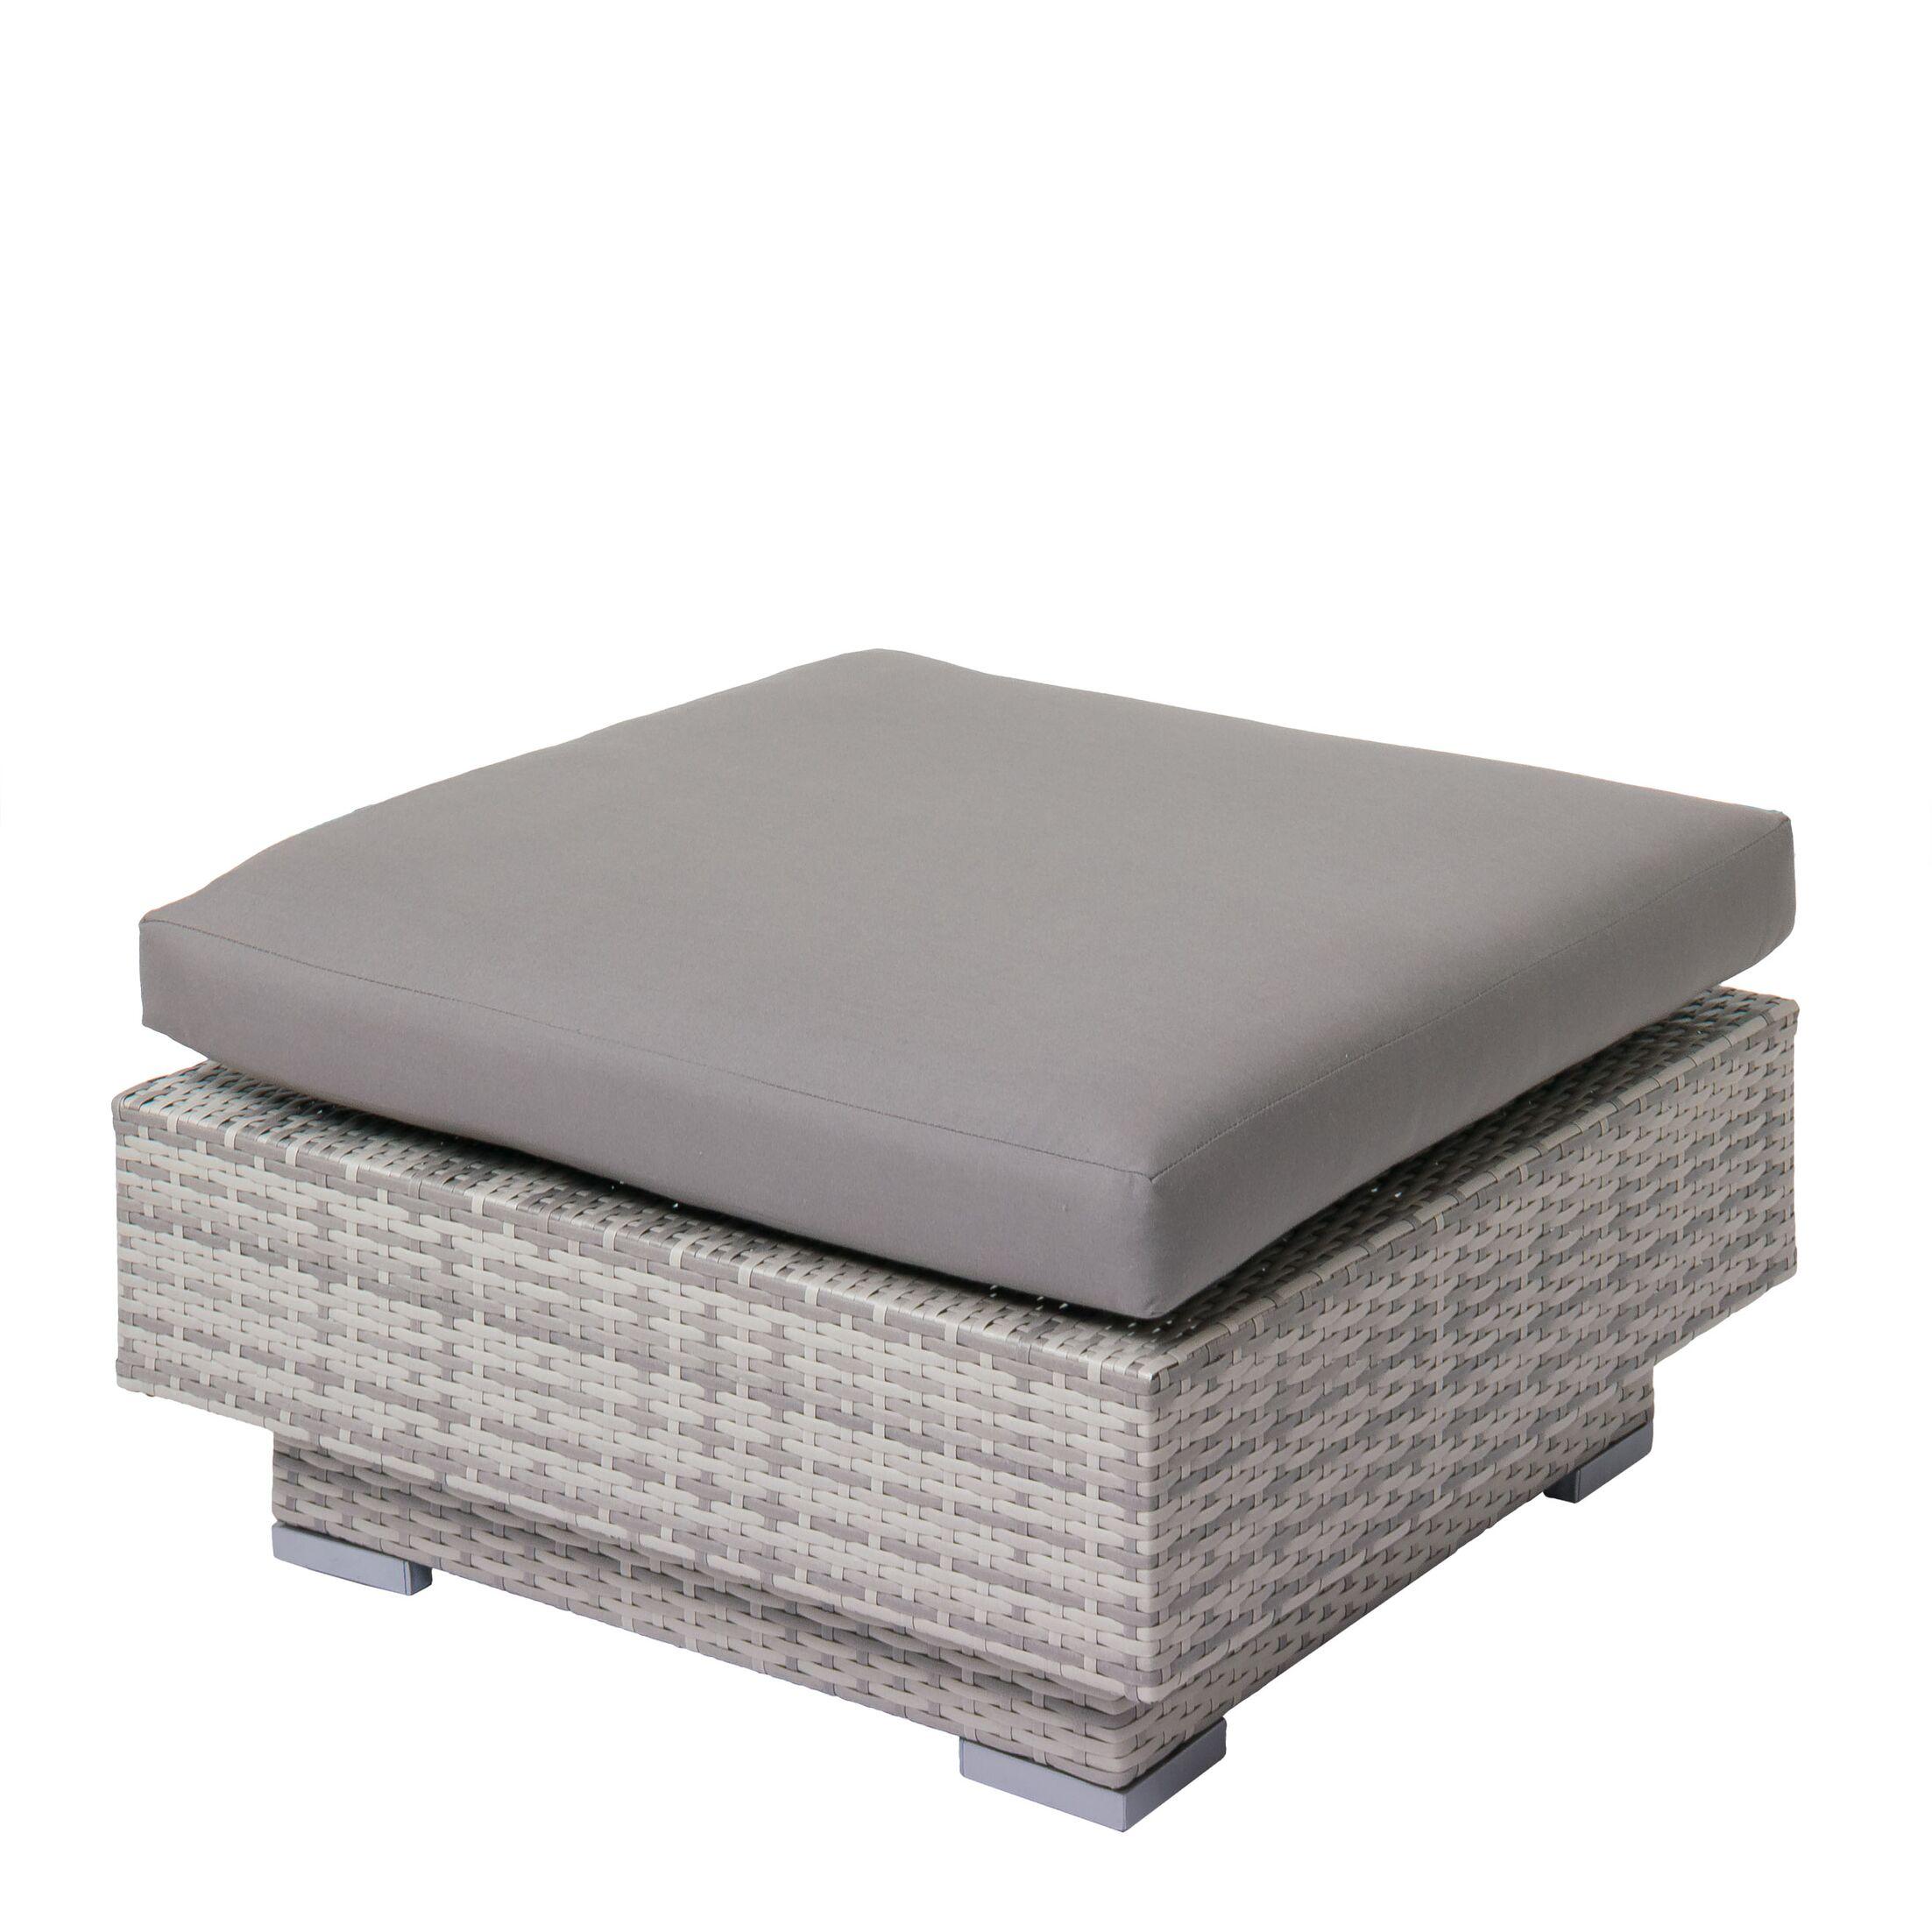 Meleri Patio Wicker Ottoman with Sunbrella Cushion Fabric: Gray